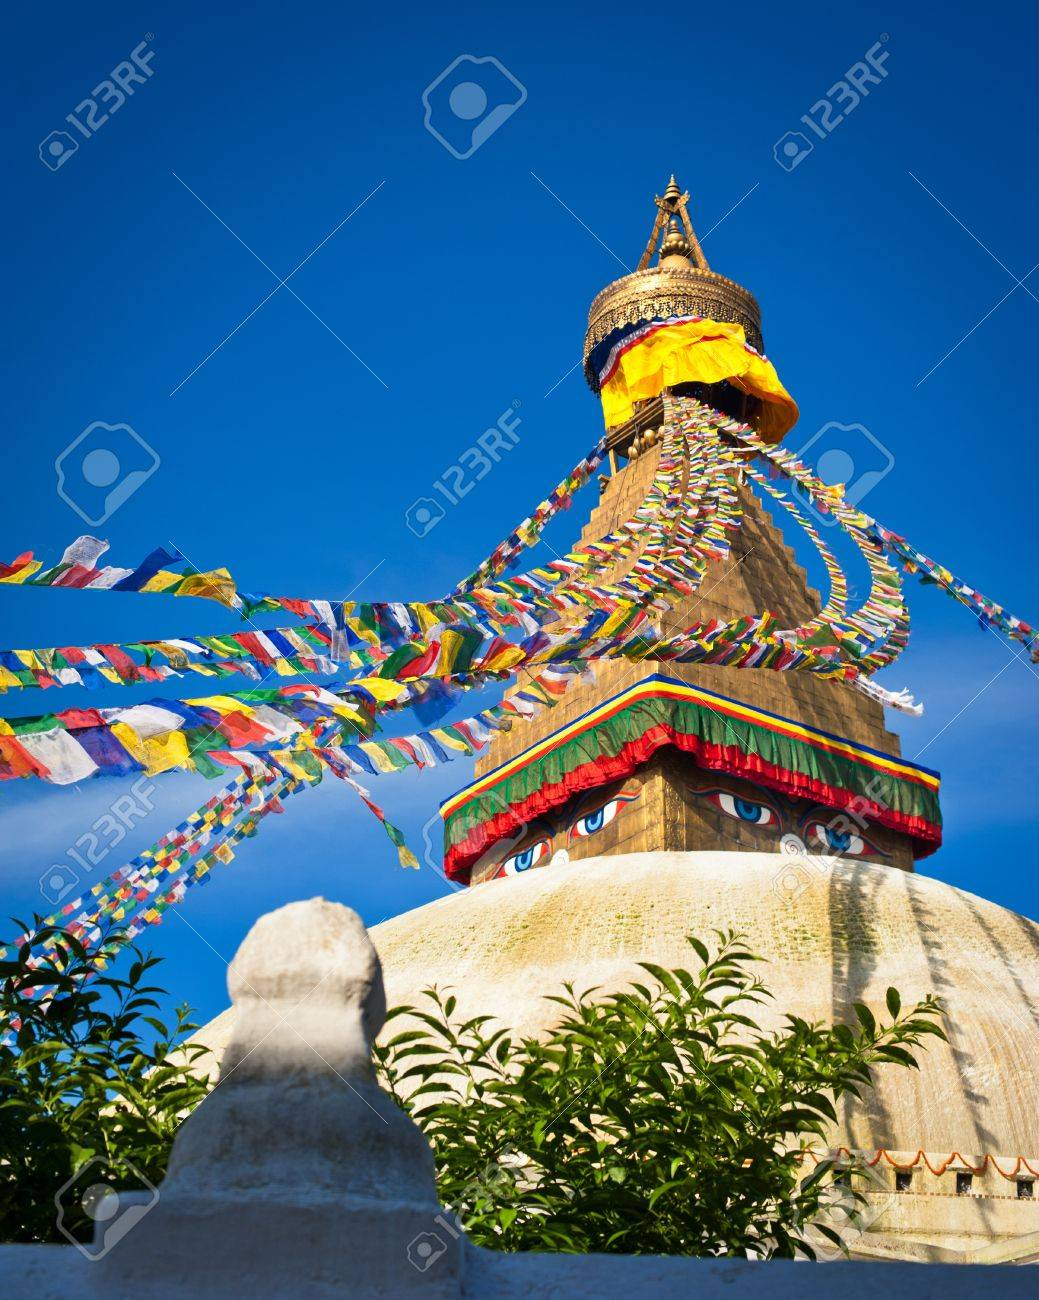 Buddhist Shrine Boudhanath Stupa with pray flags over blue sky. Nepal, Kathmandu Stock Photo - 16164031